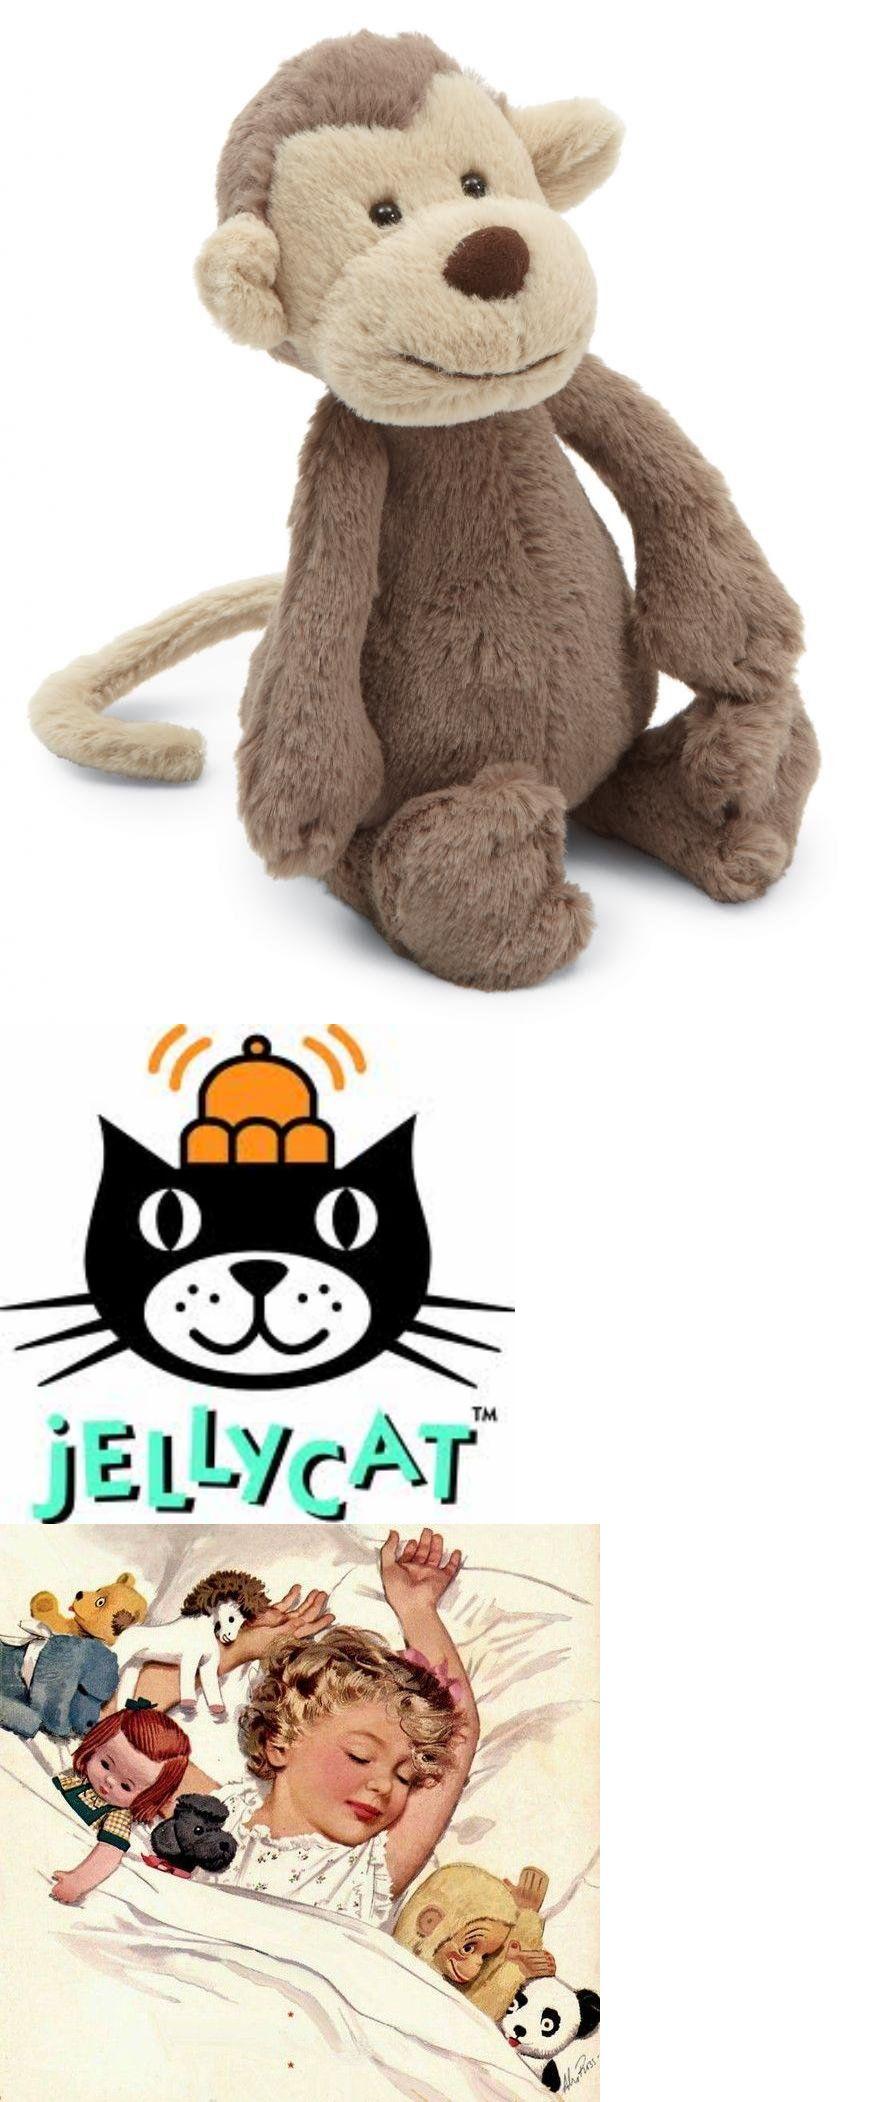 Jellycat 158786 Jellycat Bashful Monkey Stuffed Animal New With